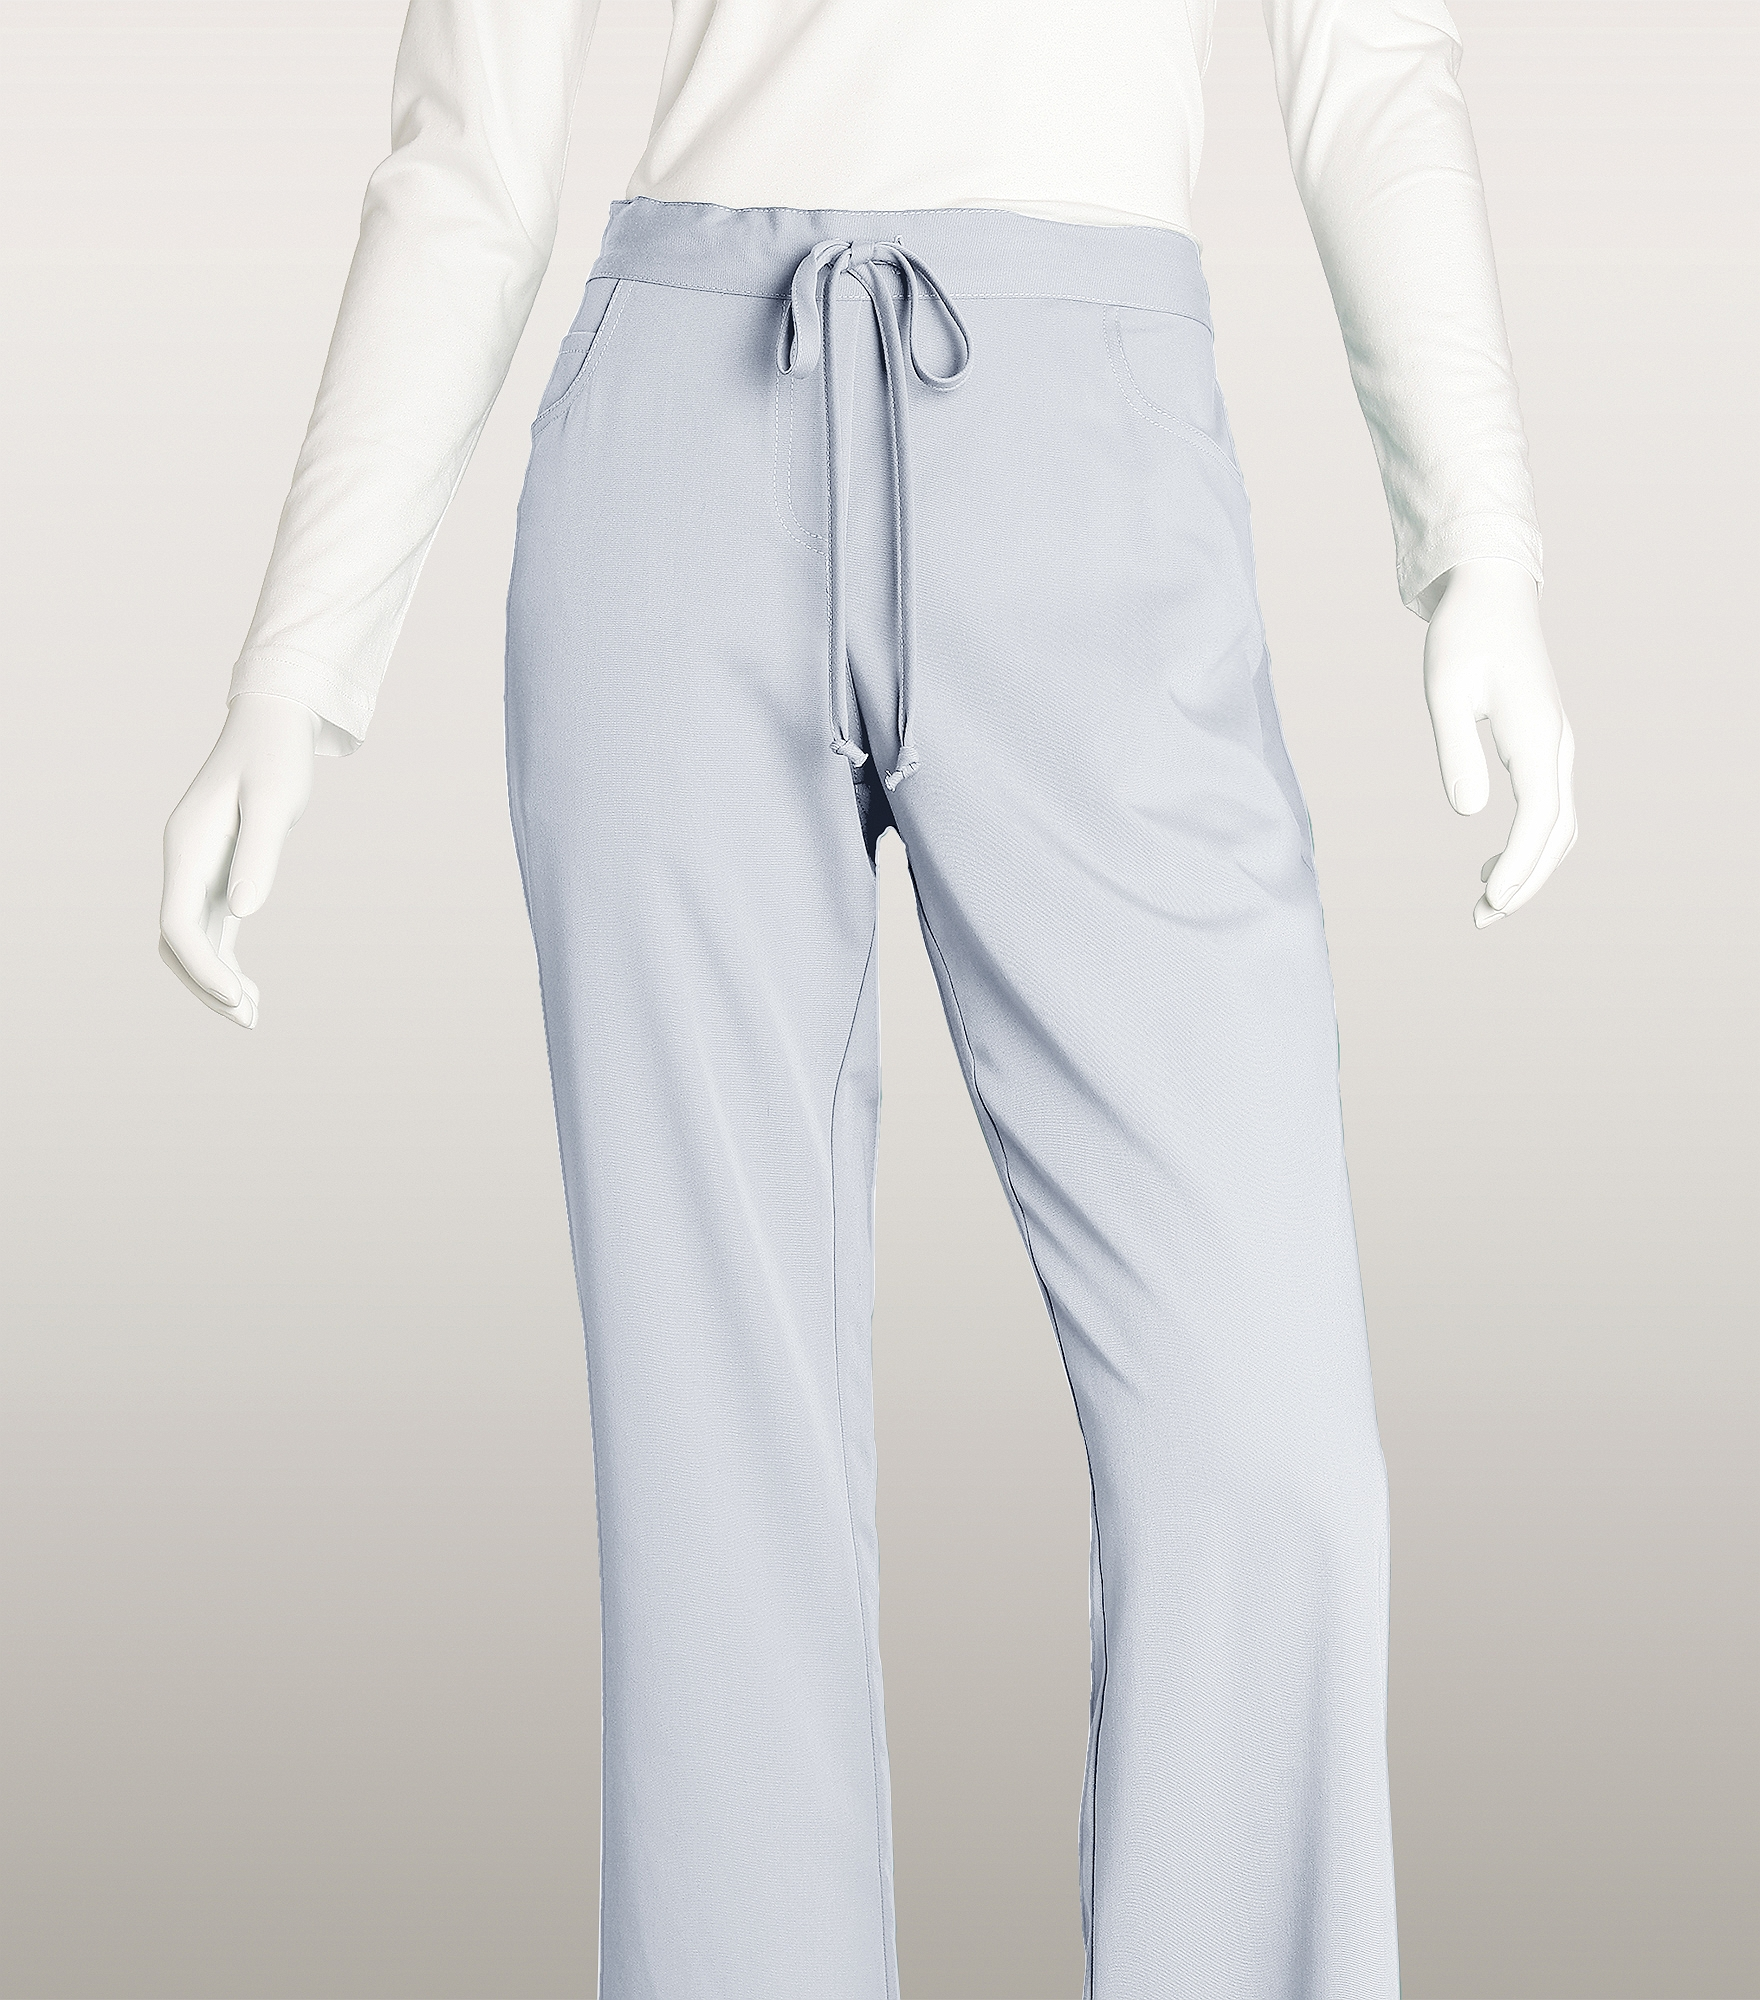 Grey\'s Anatomy Women\'s 5 Pocket Drawstring Scrub Pants-4232 ...